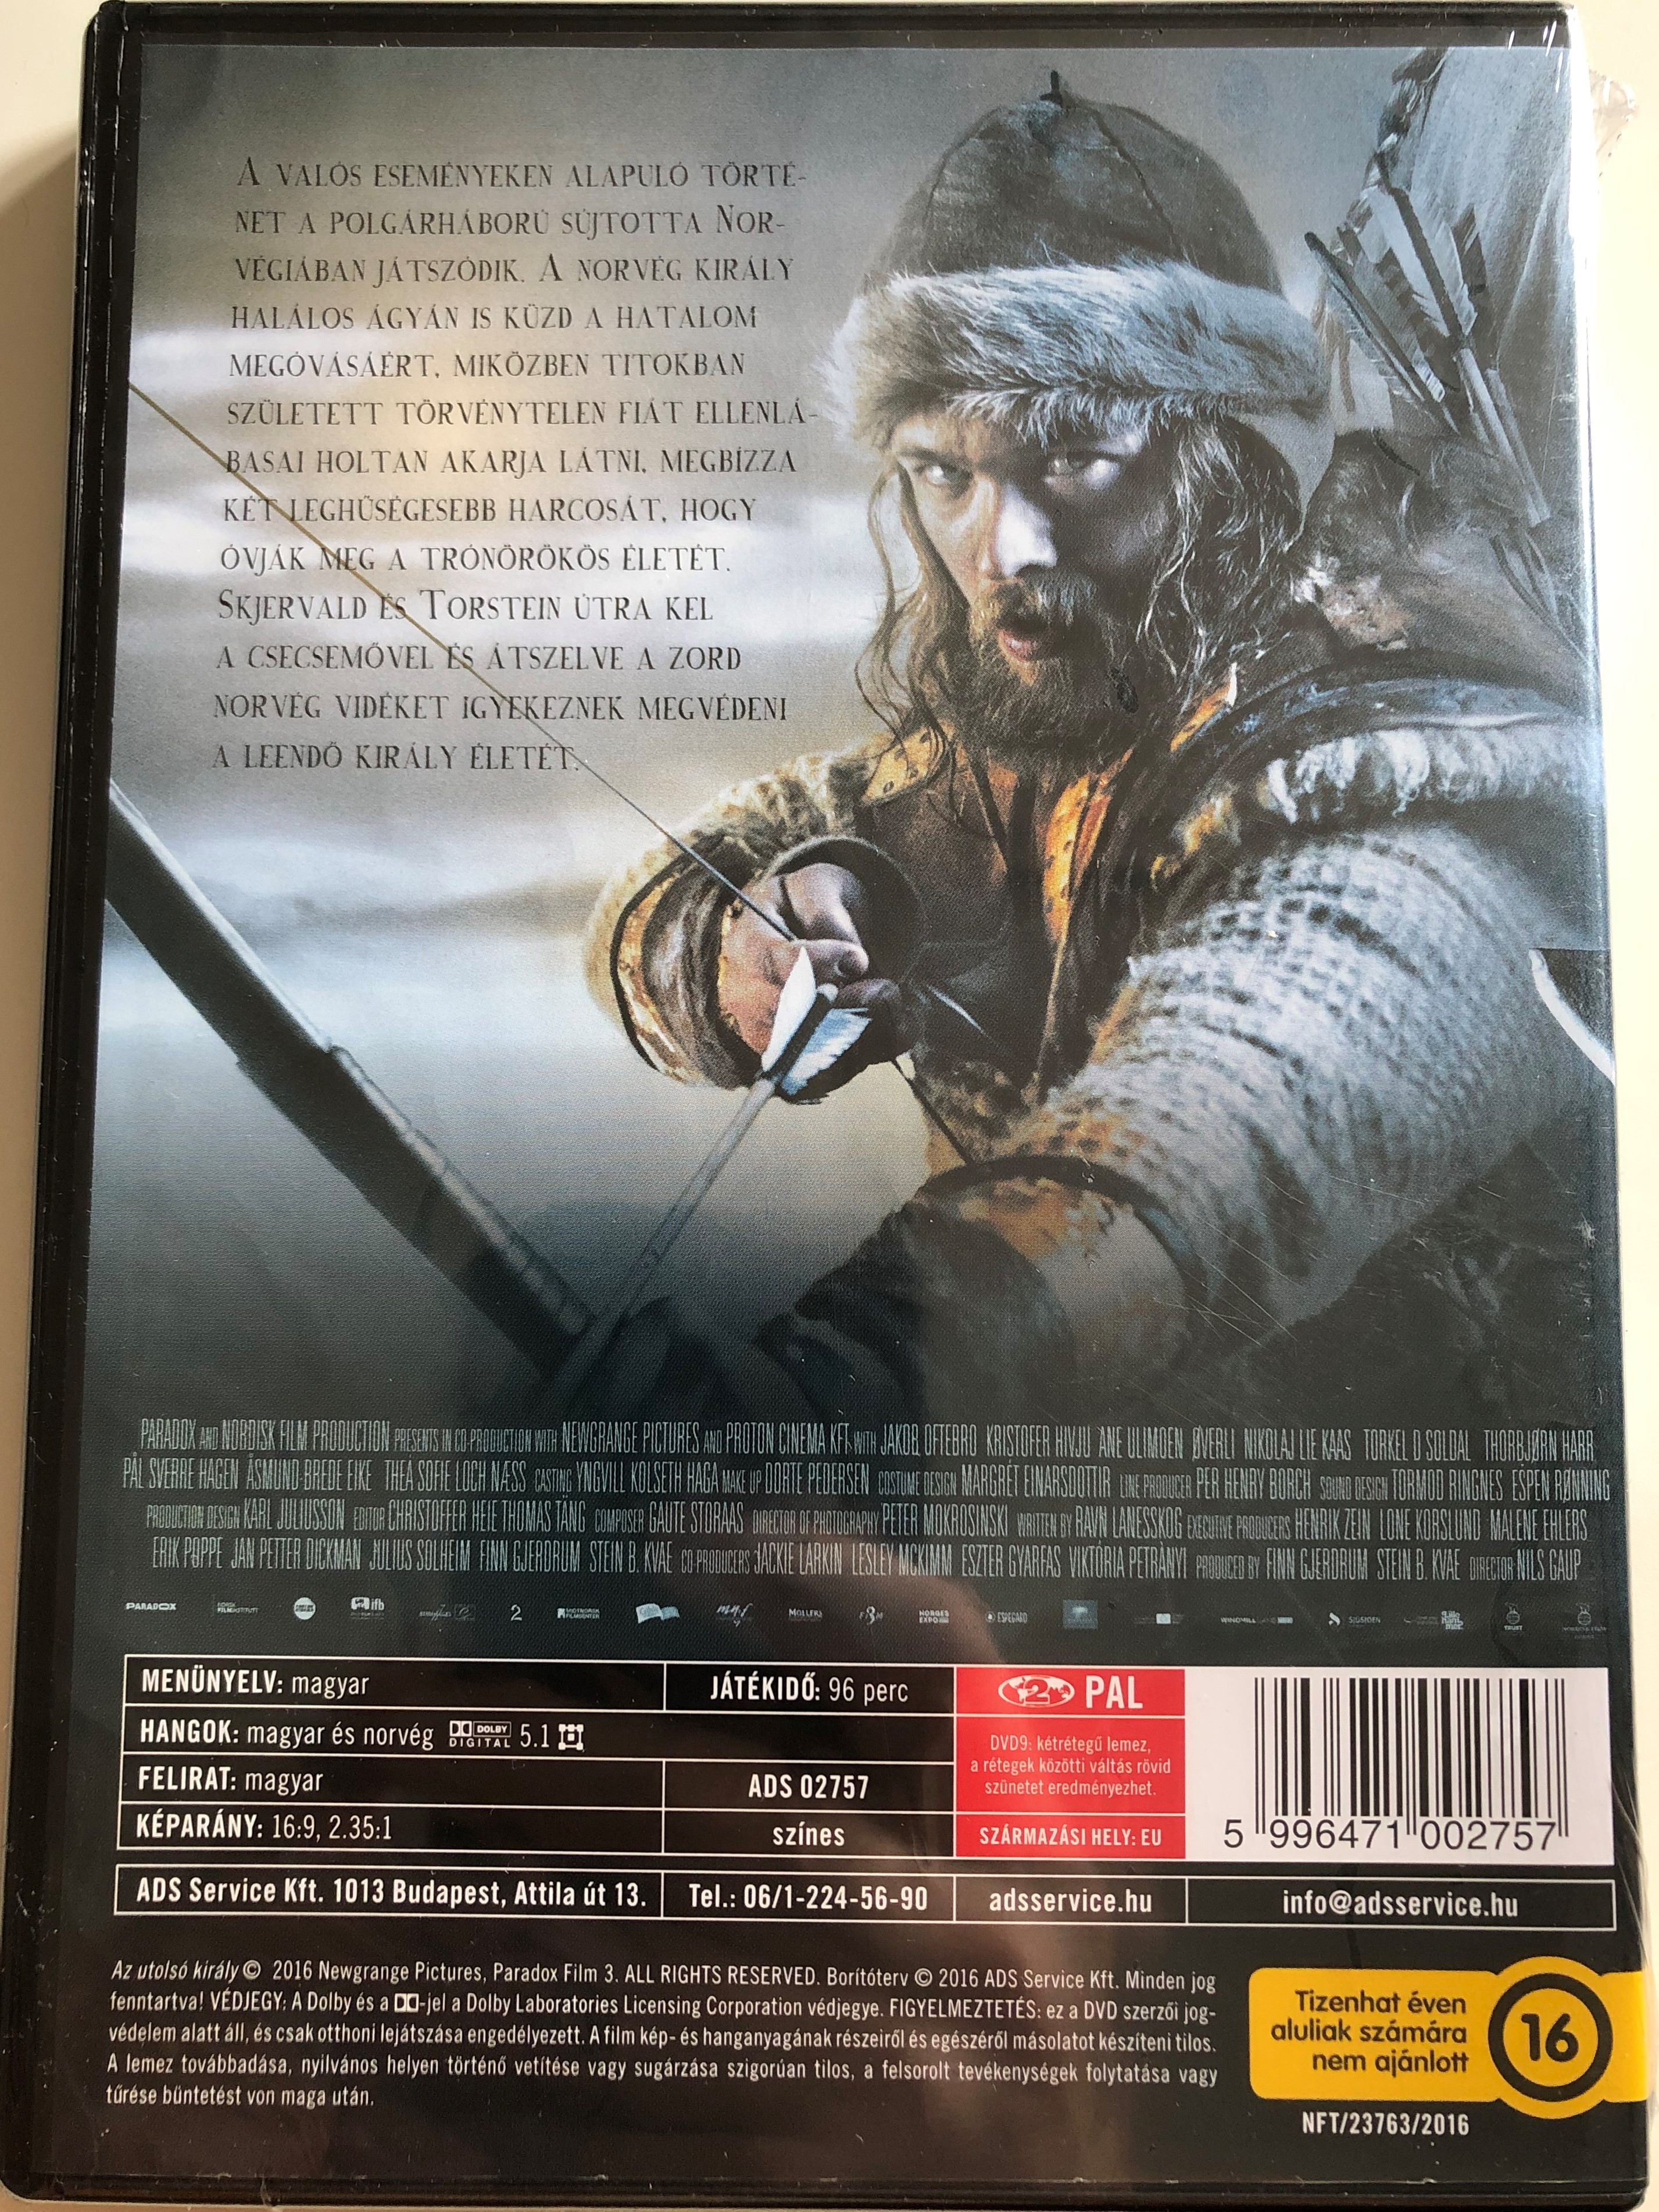 birkebeinerne-the-last-king-dvd-2015-az-utols-kir-ly-directed-by-nils-gaup-starring-jakob-oftebro-kristofer-hivju-thorbj-rn-harr-p-l-sverre-valheim-hagen-ane-ulmoen-verli-2-.jpg